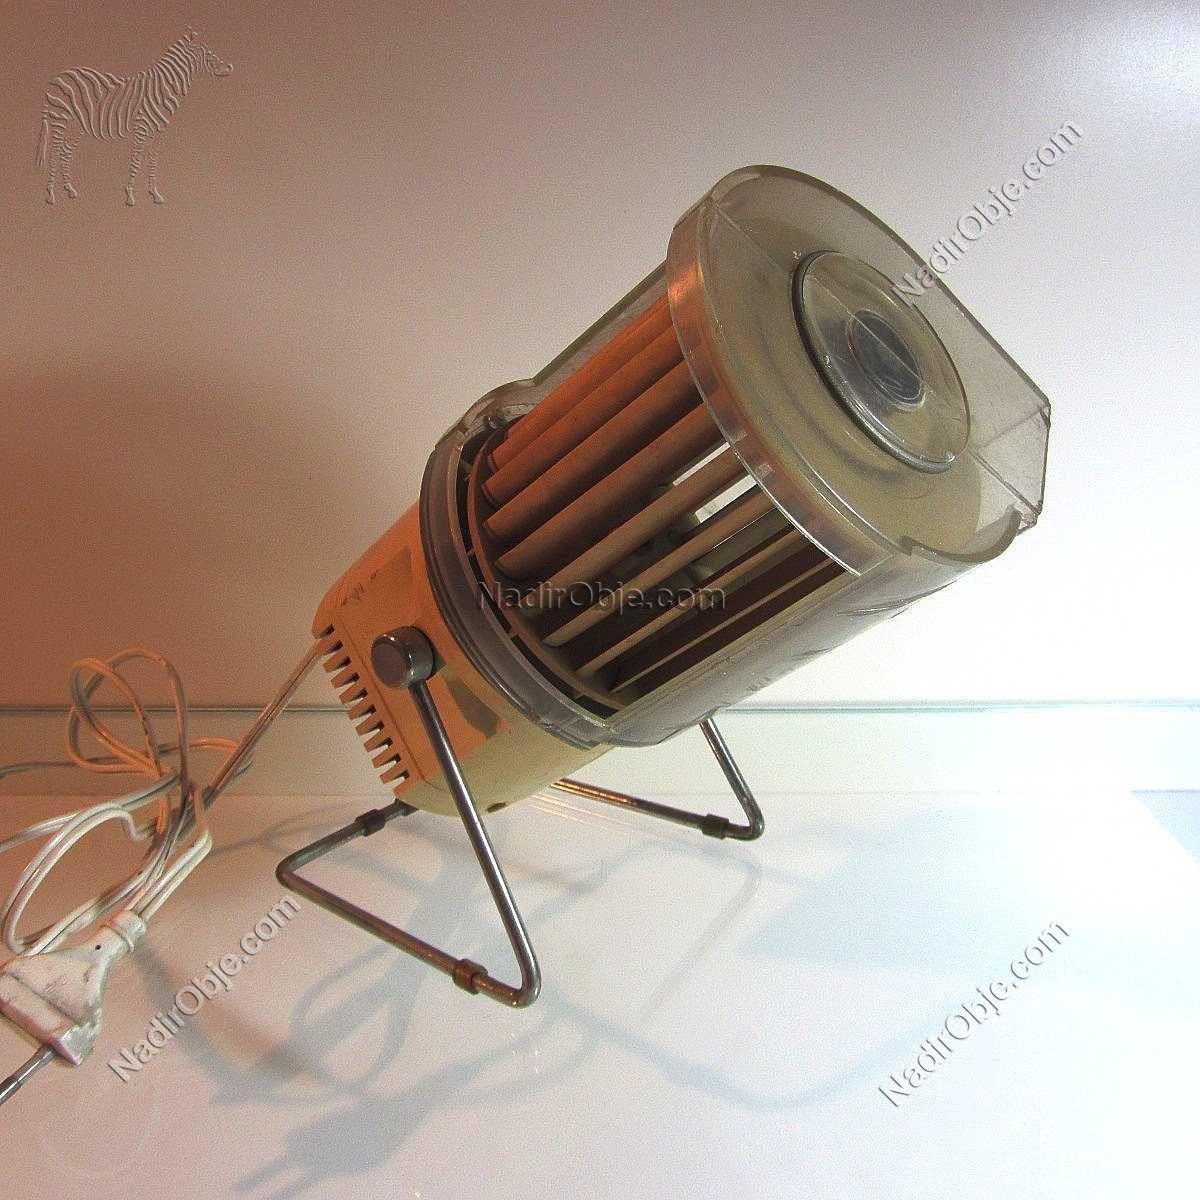 Vintage Vantilatör Mekanik-Elektrikli Objeler Pervane